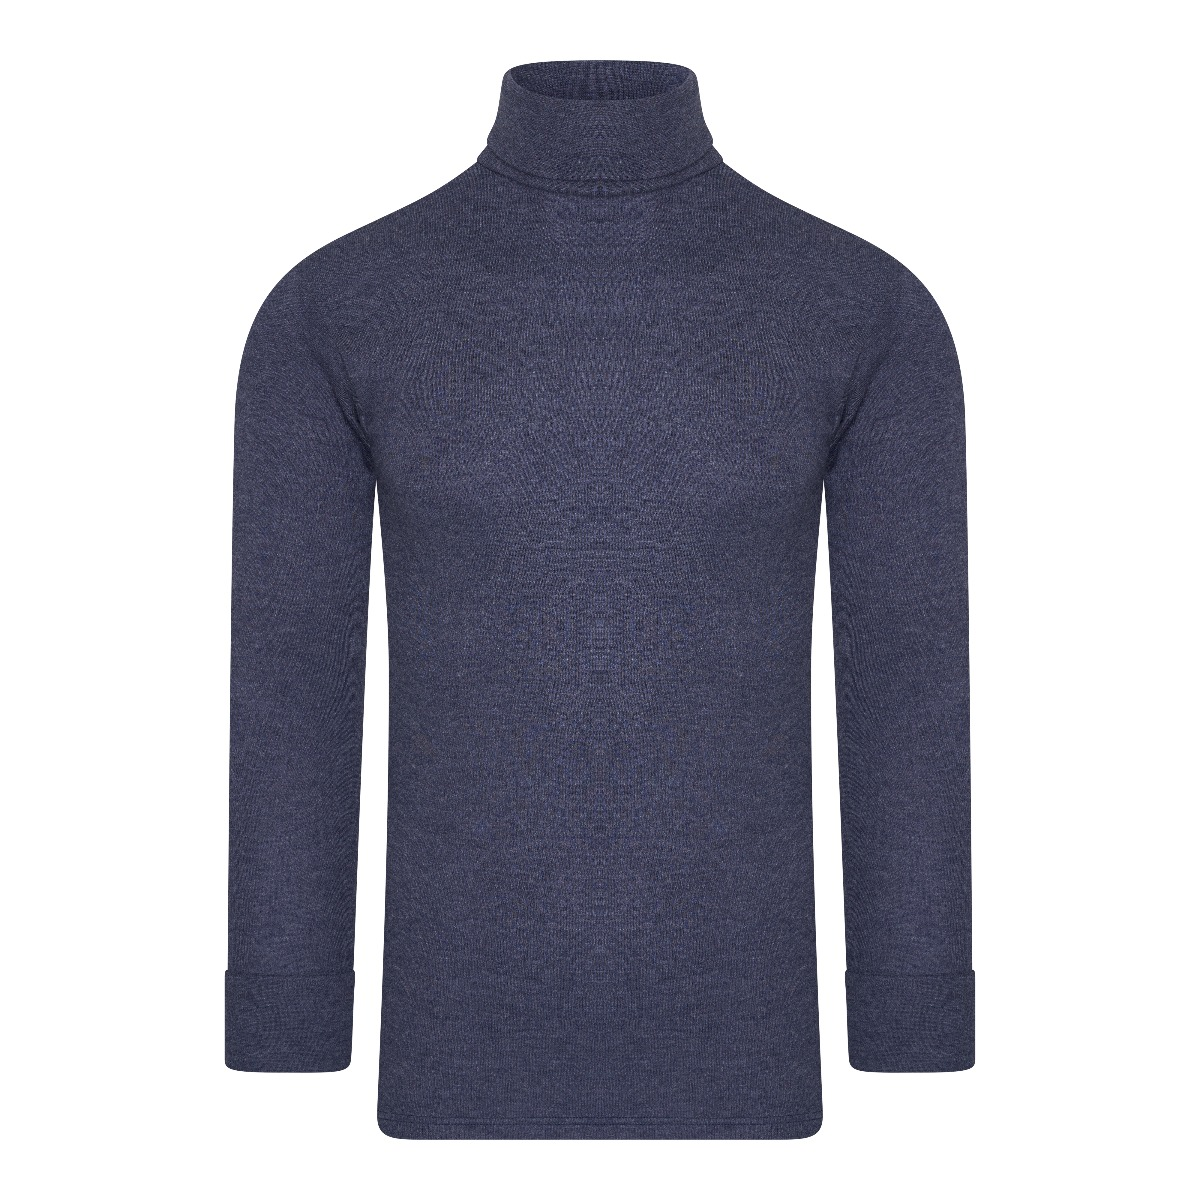 Beeren Thermo Unisex Shirt Col Lange Mouw Marine L